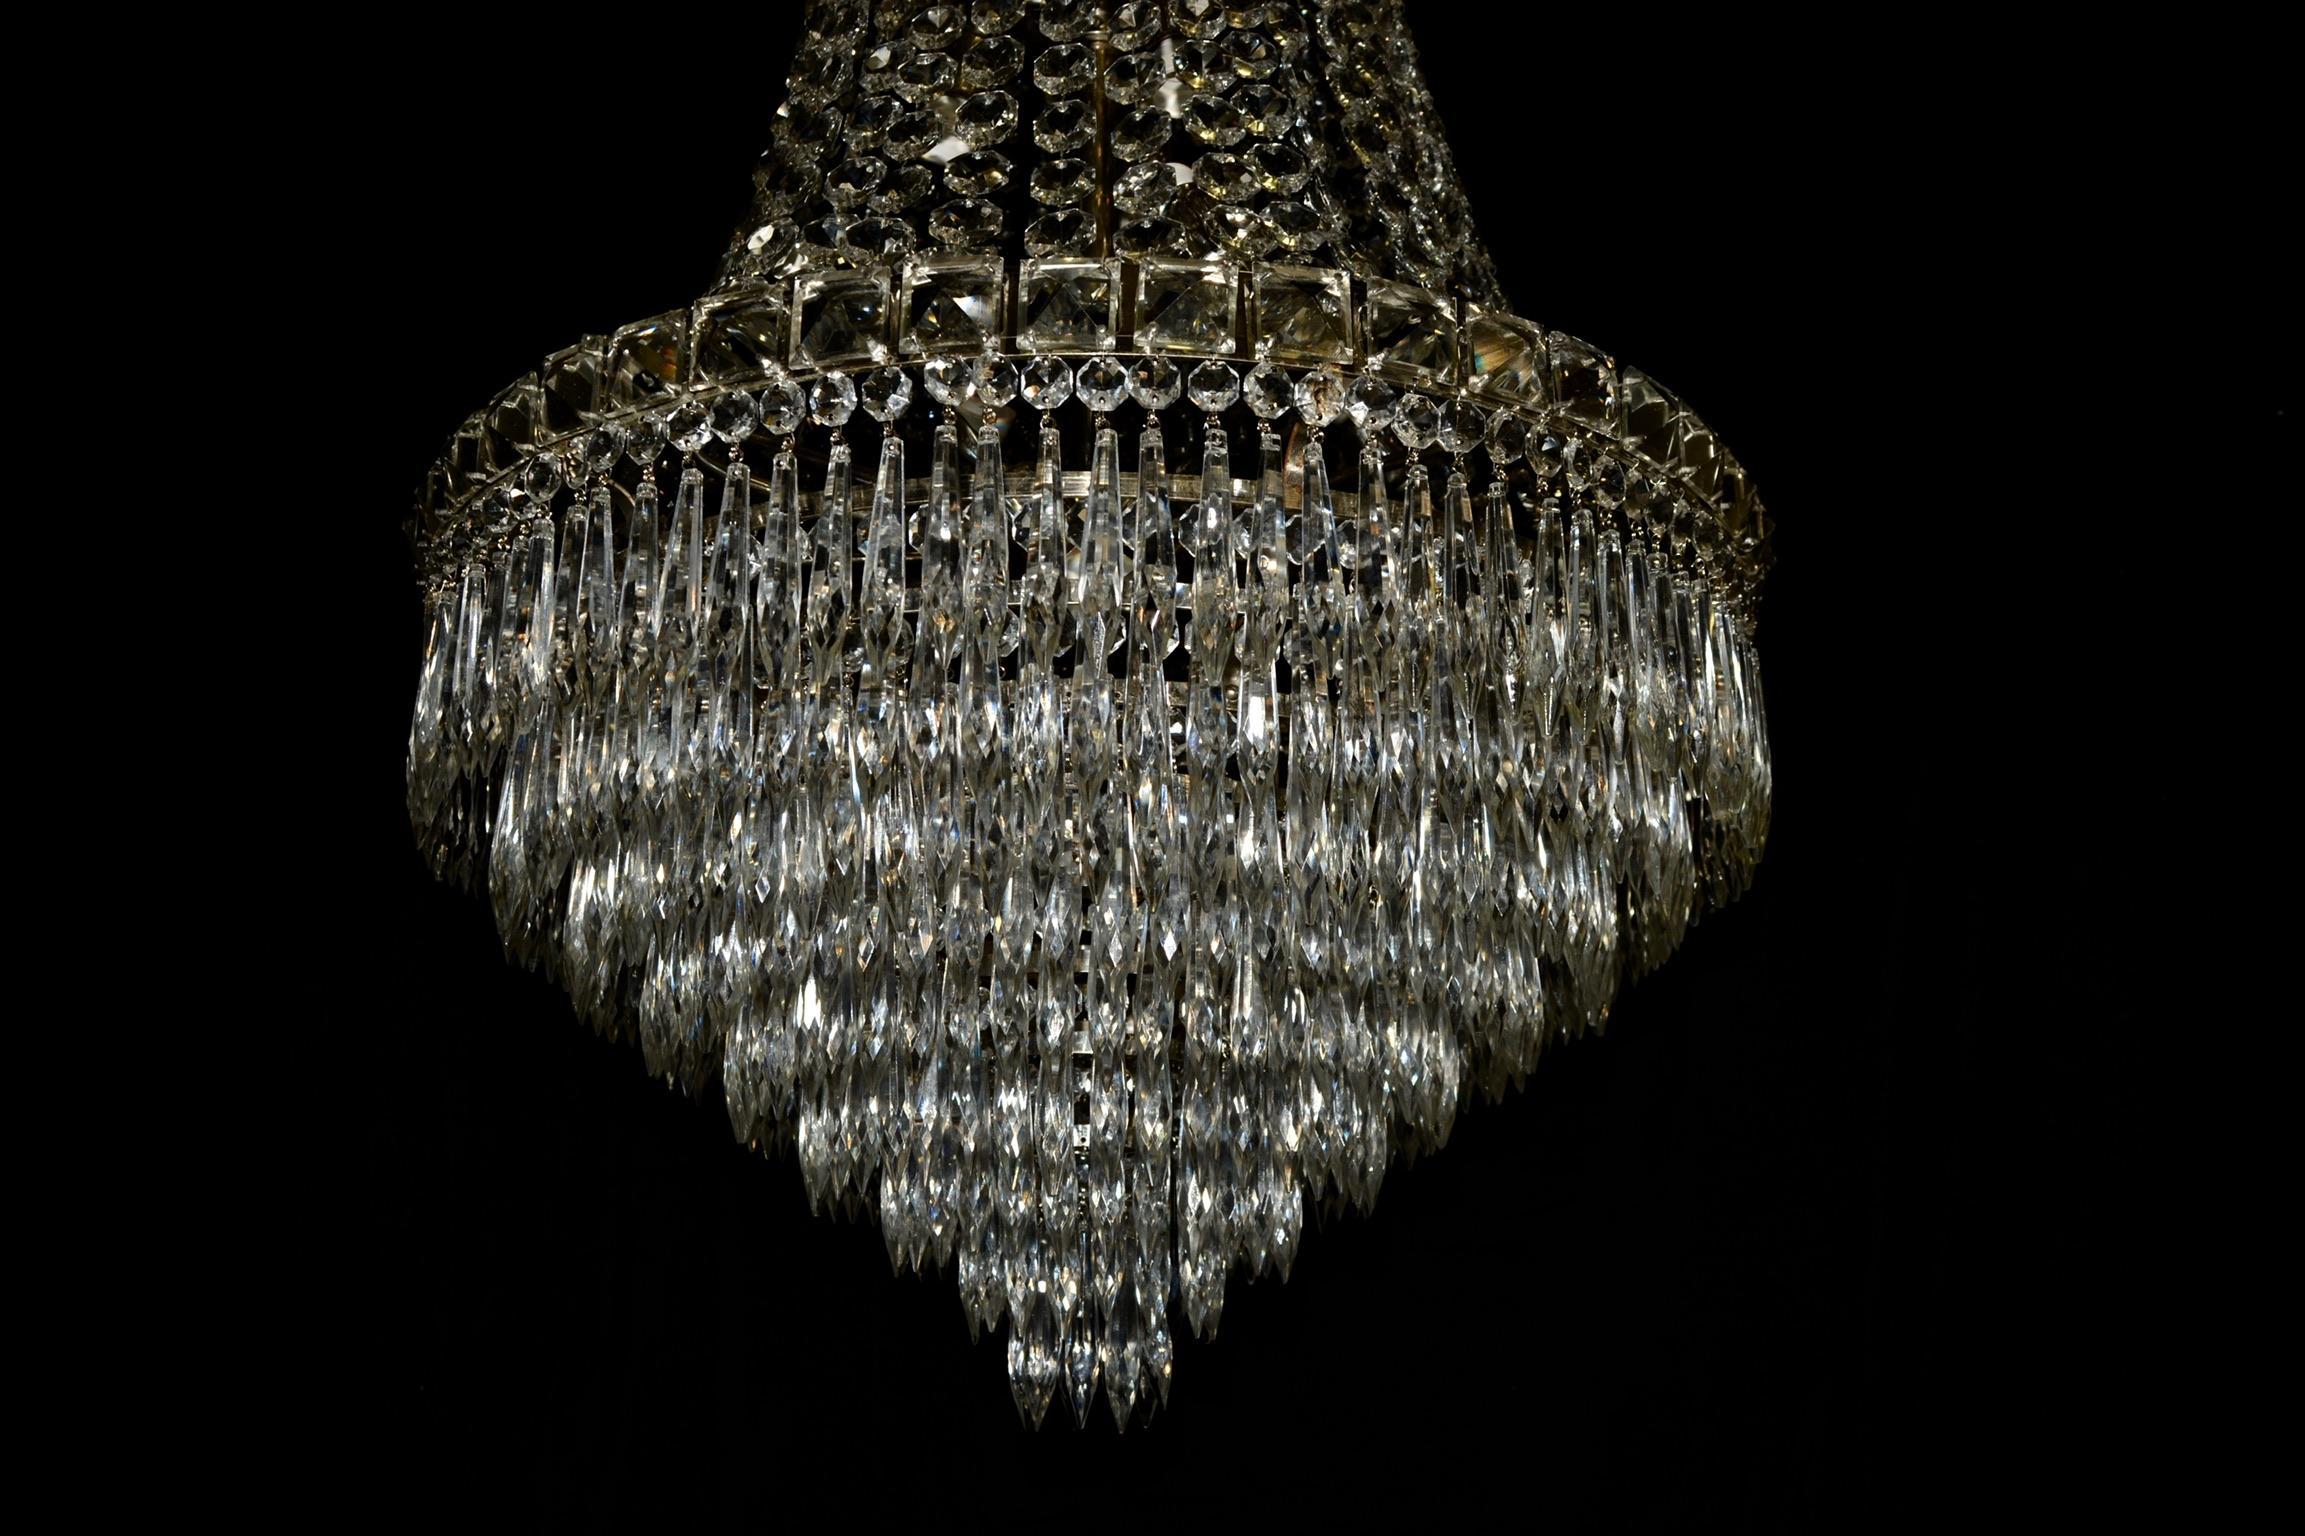 Kronleuchter Kristall Silber ~ Kronleuchter kristall anhänger antike vergoldeter bronze